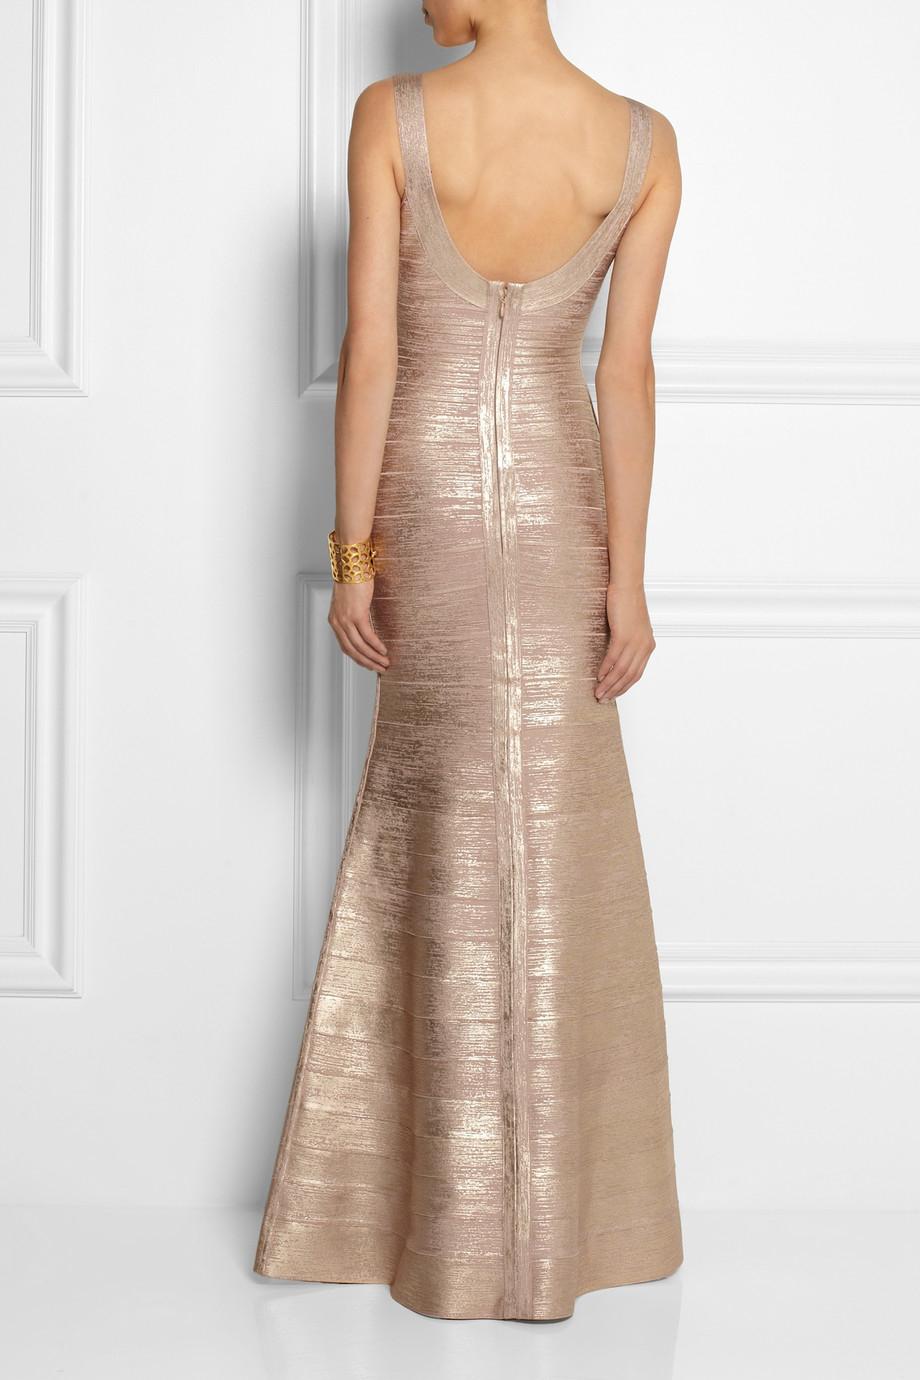 Herv 233 L 233 Ger Ellen Metallic Bandage Gown In Pink Lyst